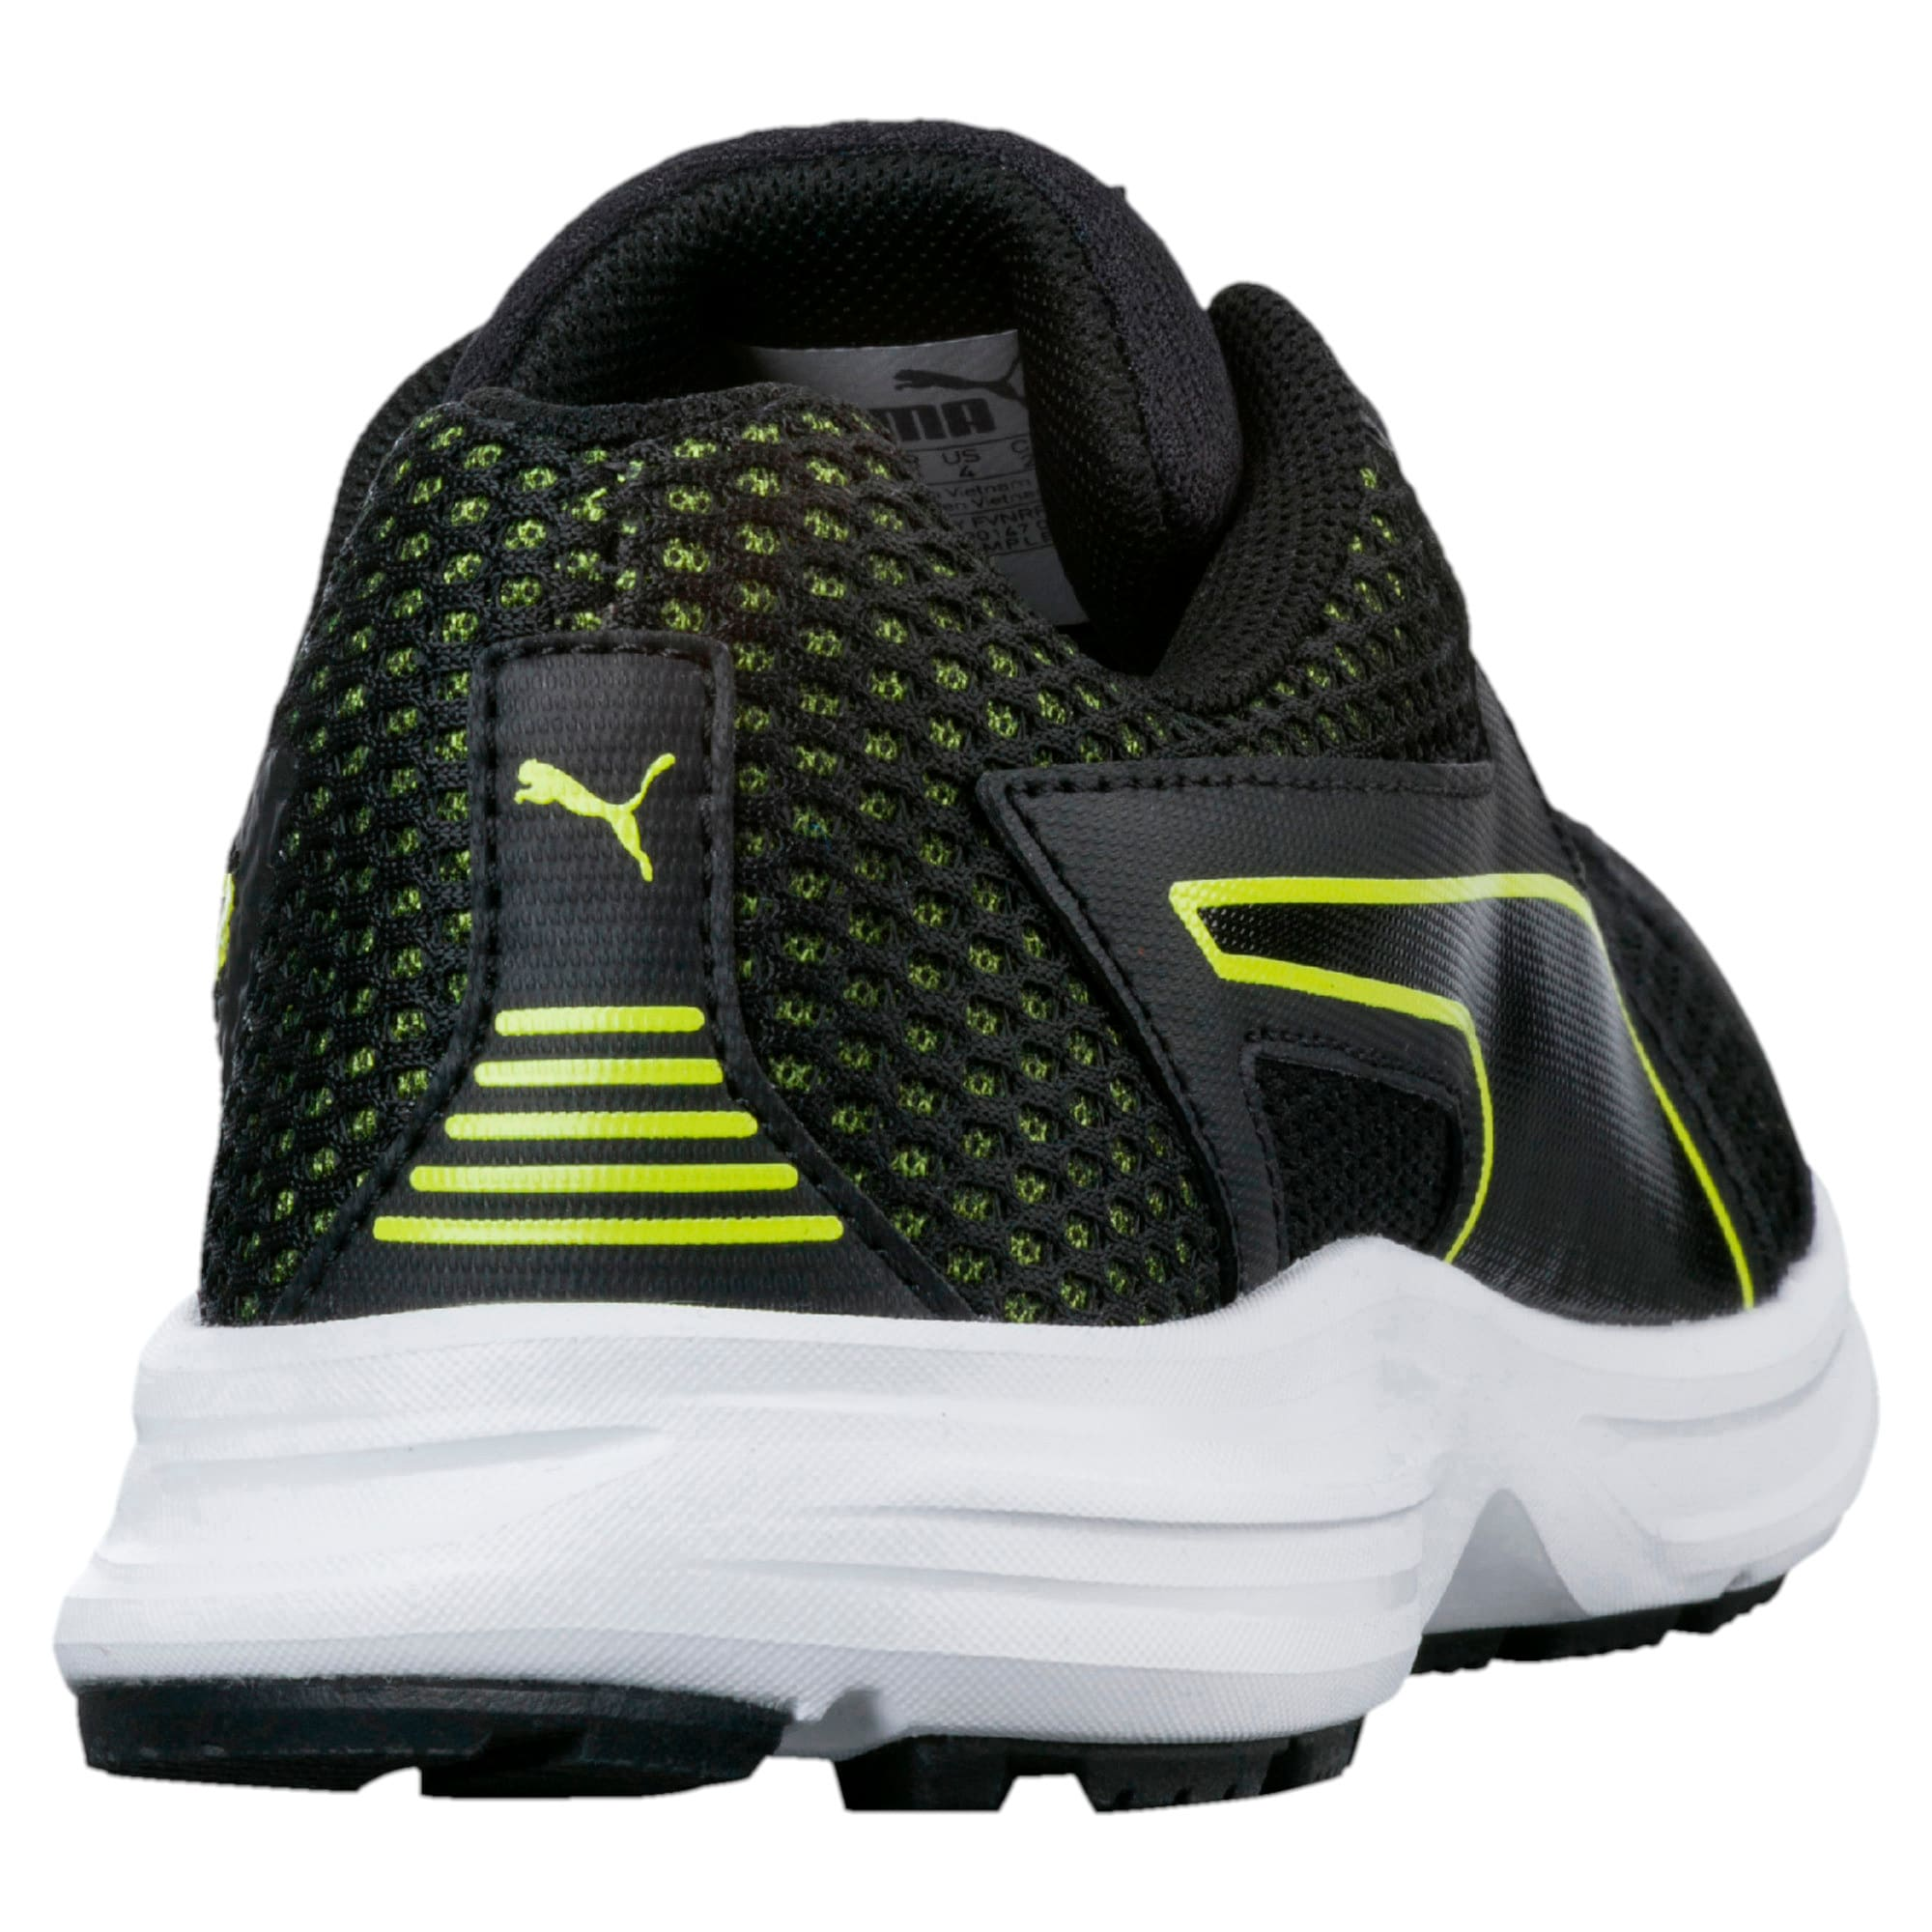 Thumbnail 4 of Essential Runner Kids' Running Shoes, Puma Black-Nrgy Yellow, medium-IND